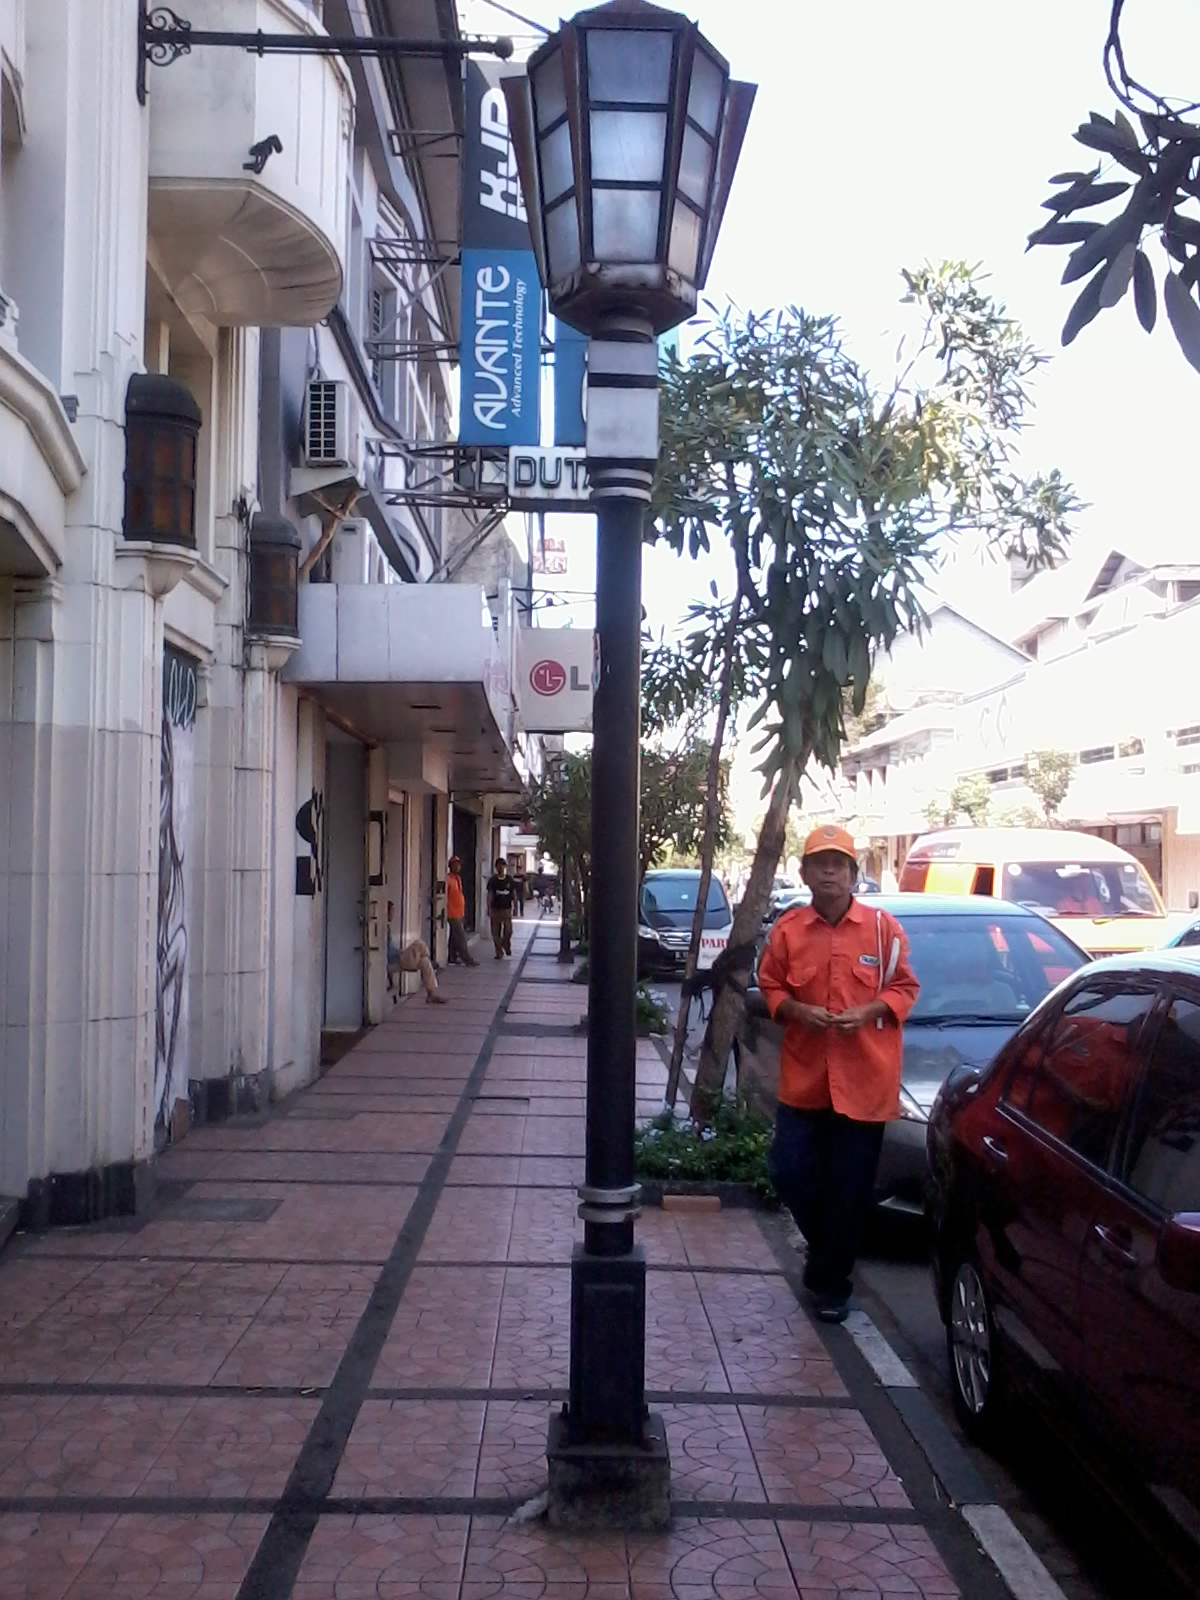 Pengalaman Hidup Pilihan Wisata Menarik Bandung Lampu Jalan Khas Braga